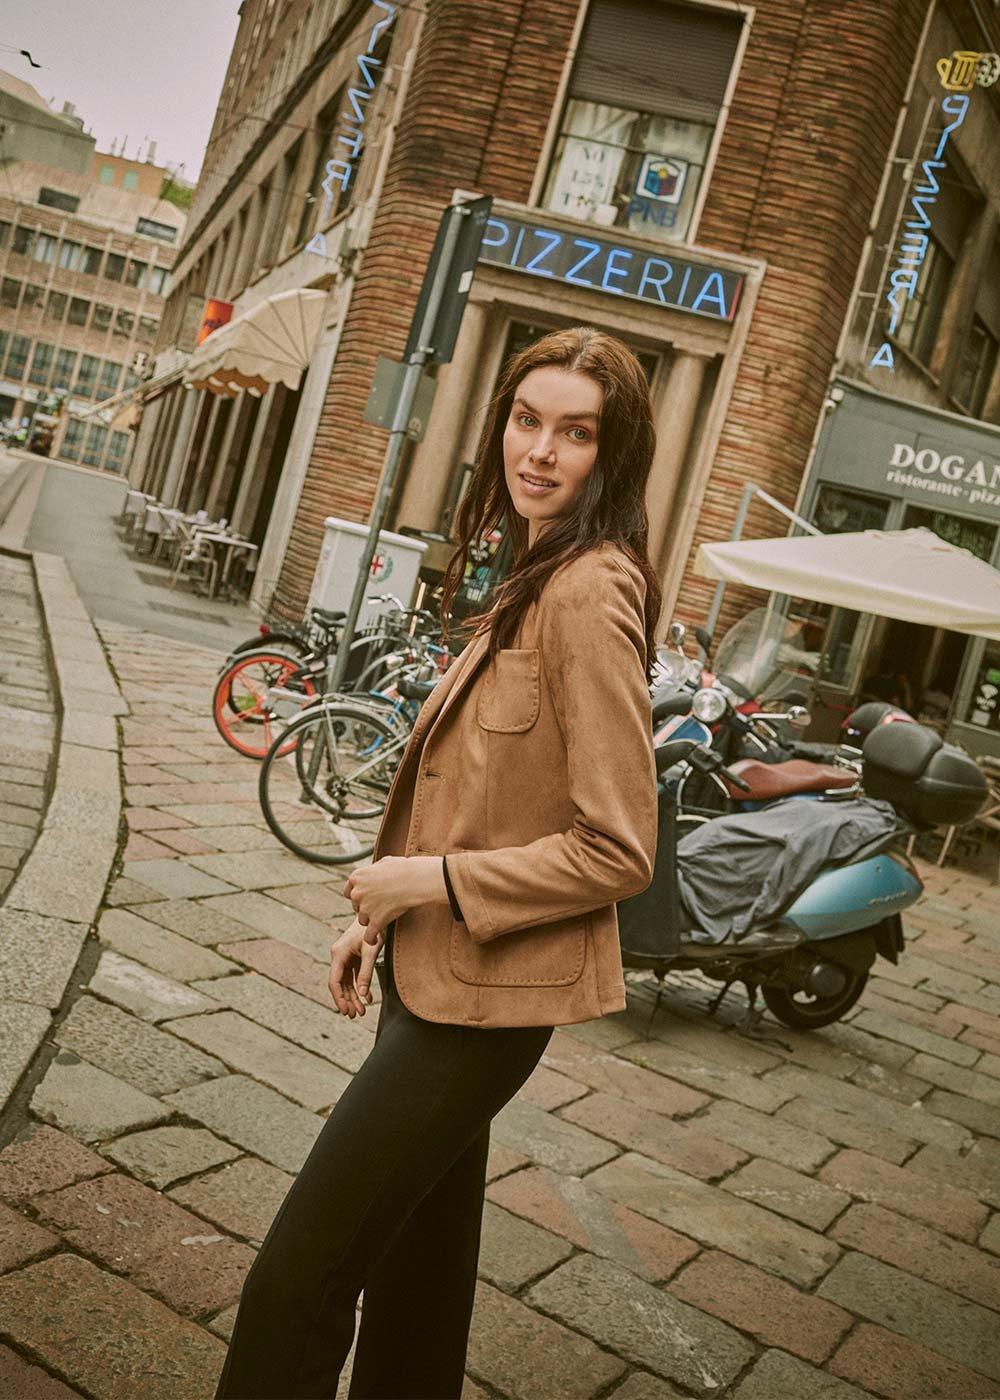 Kelly faux-suede jacket - Brown - Woman